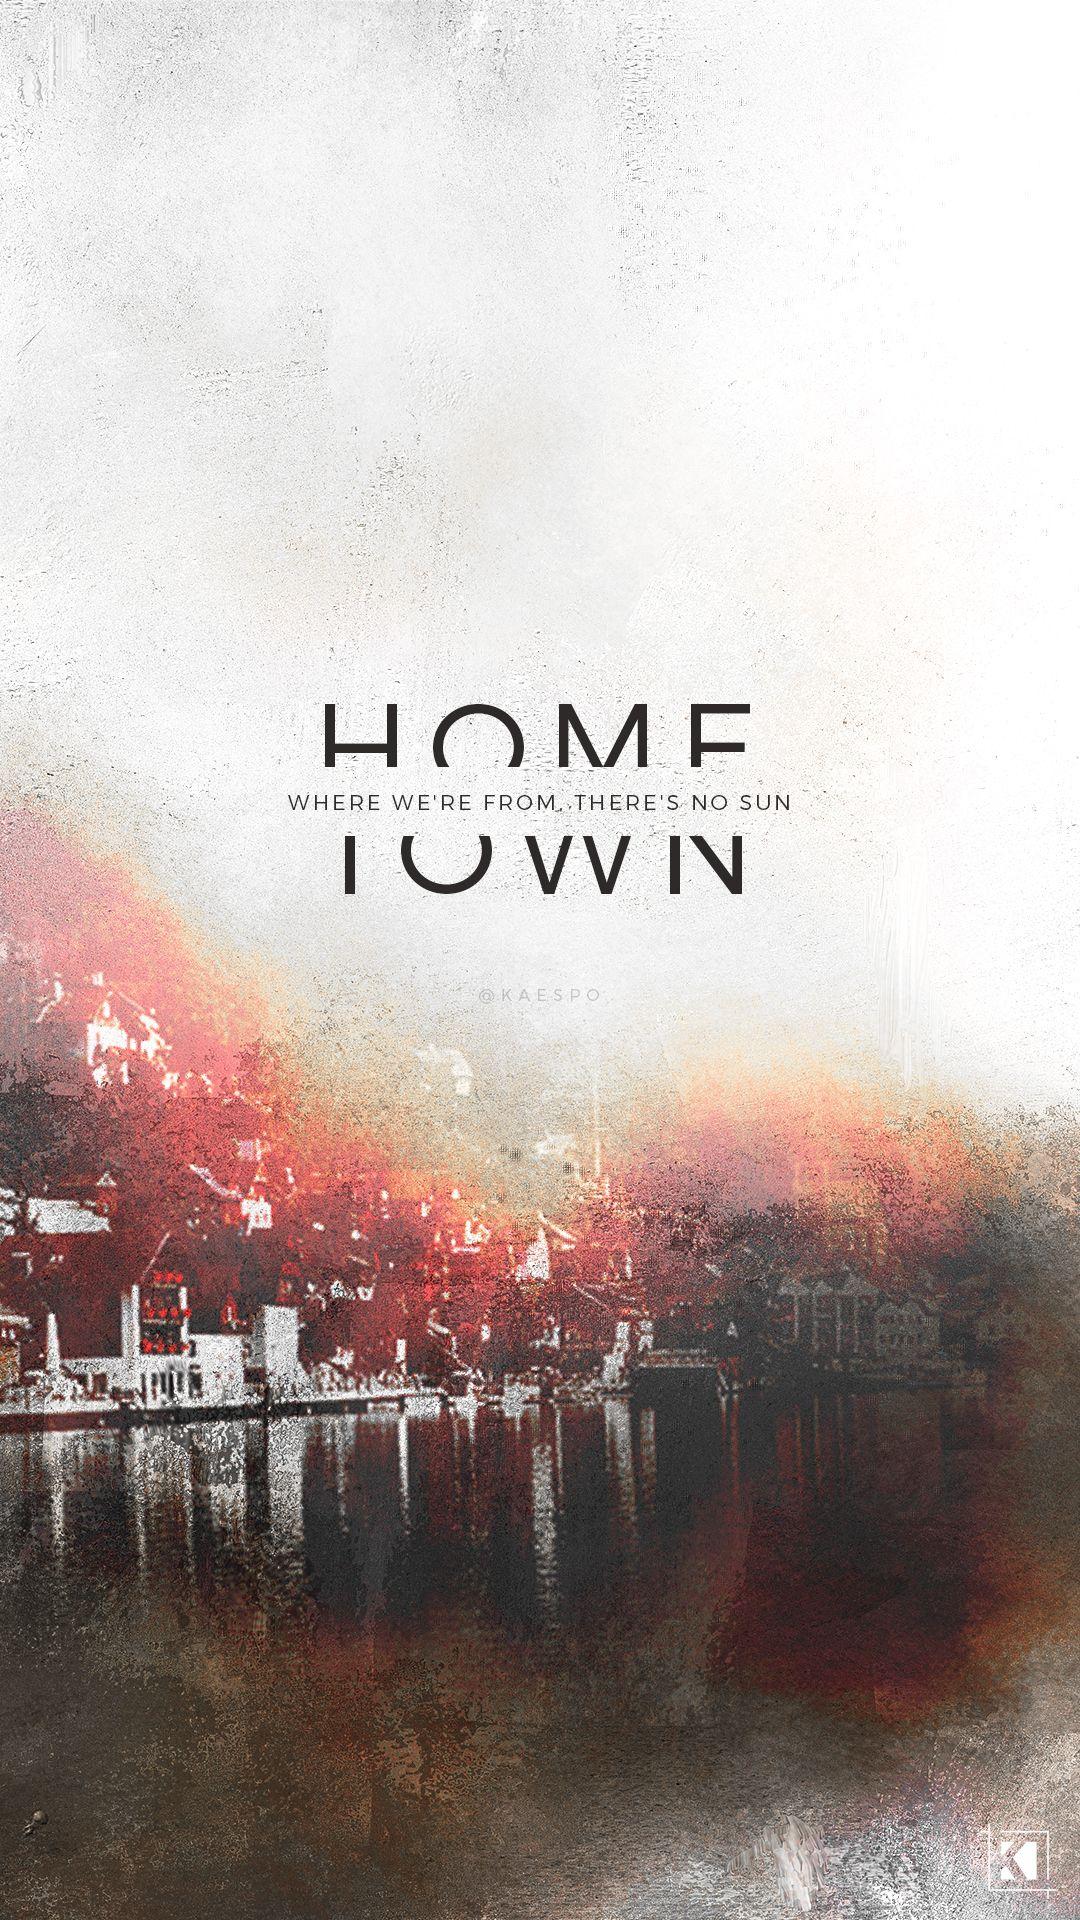 Hometown Lyrics By Twenty One Pilots Blurryface Kaespo Twenty One Pilots Lyrics Twenty One Pilots Wallpaper Twenty One Pilots